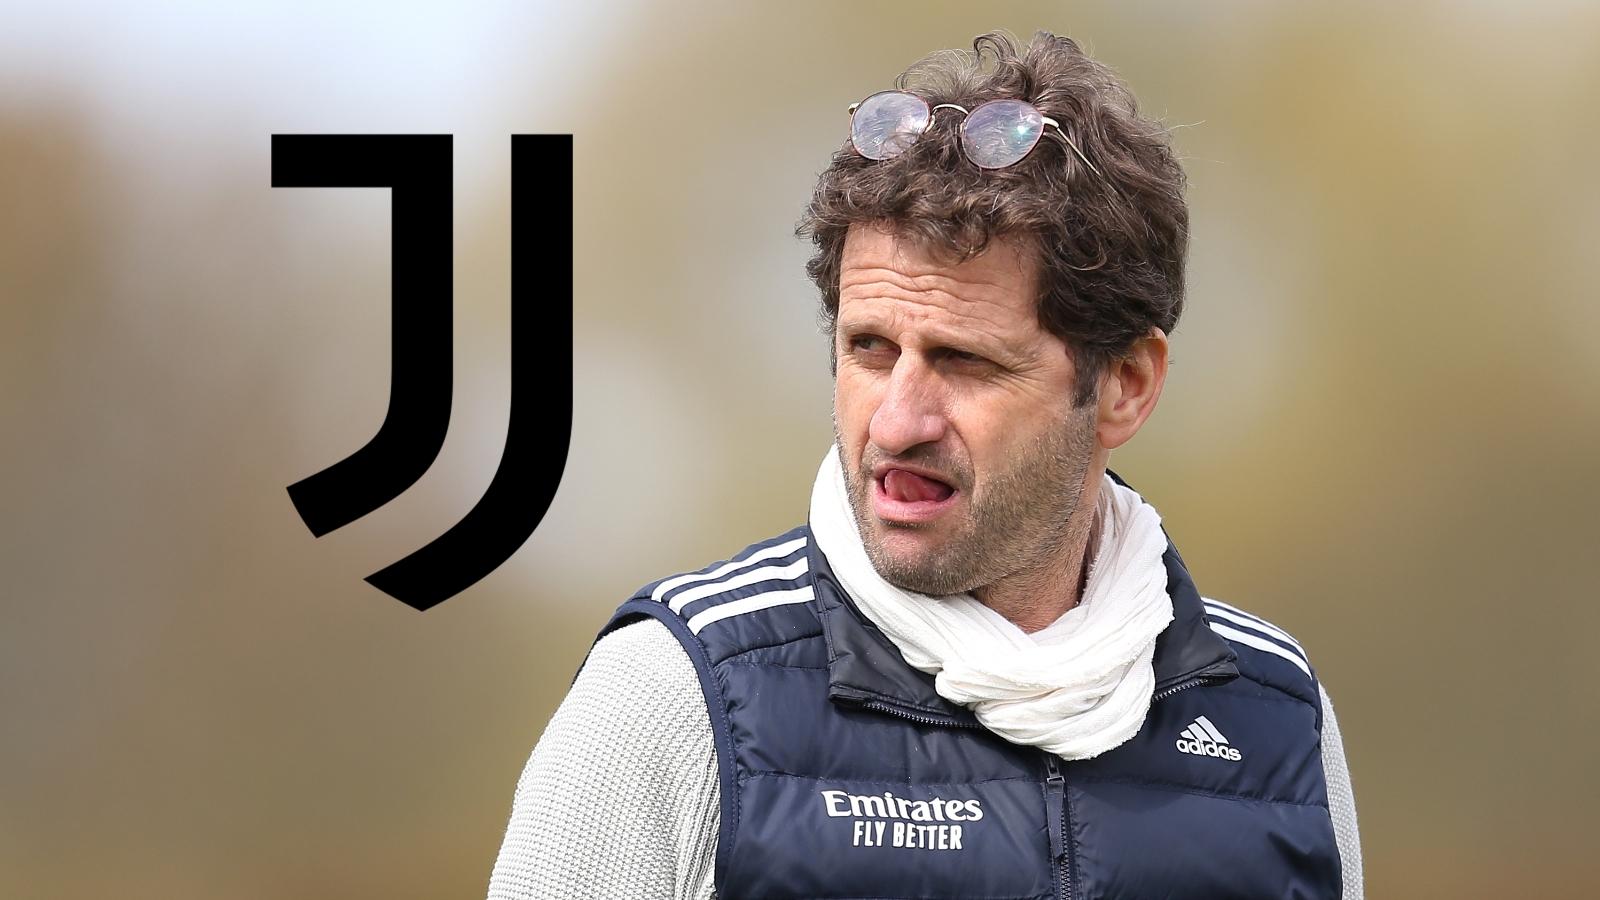 Joe Montemurro announced as new Juventus head coach following Arsenal departure